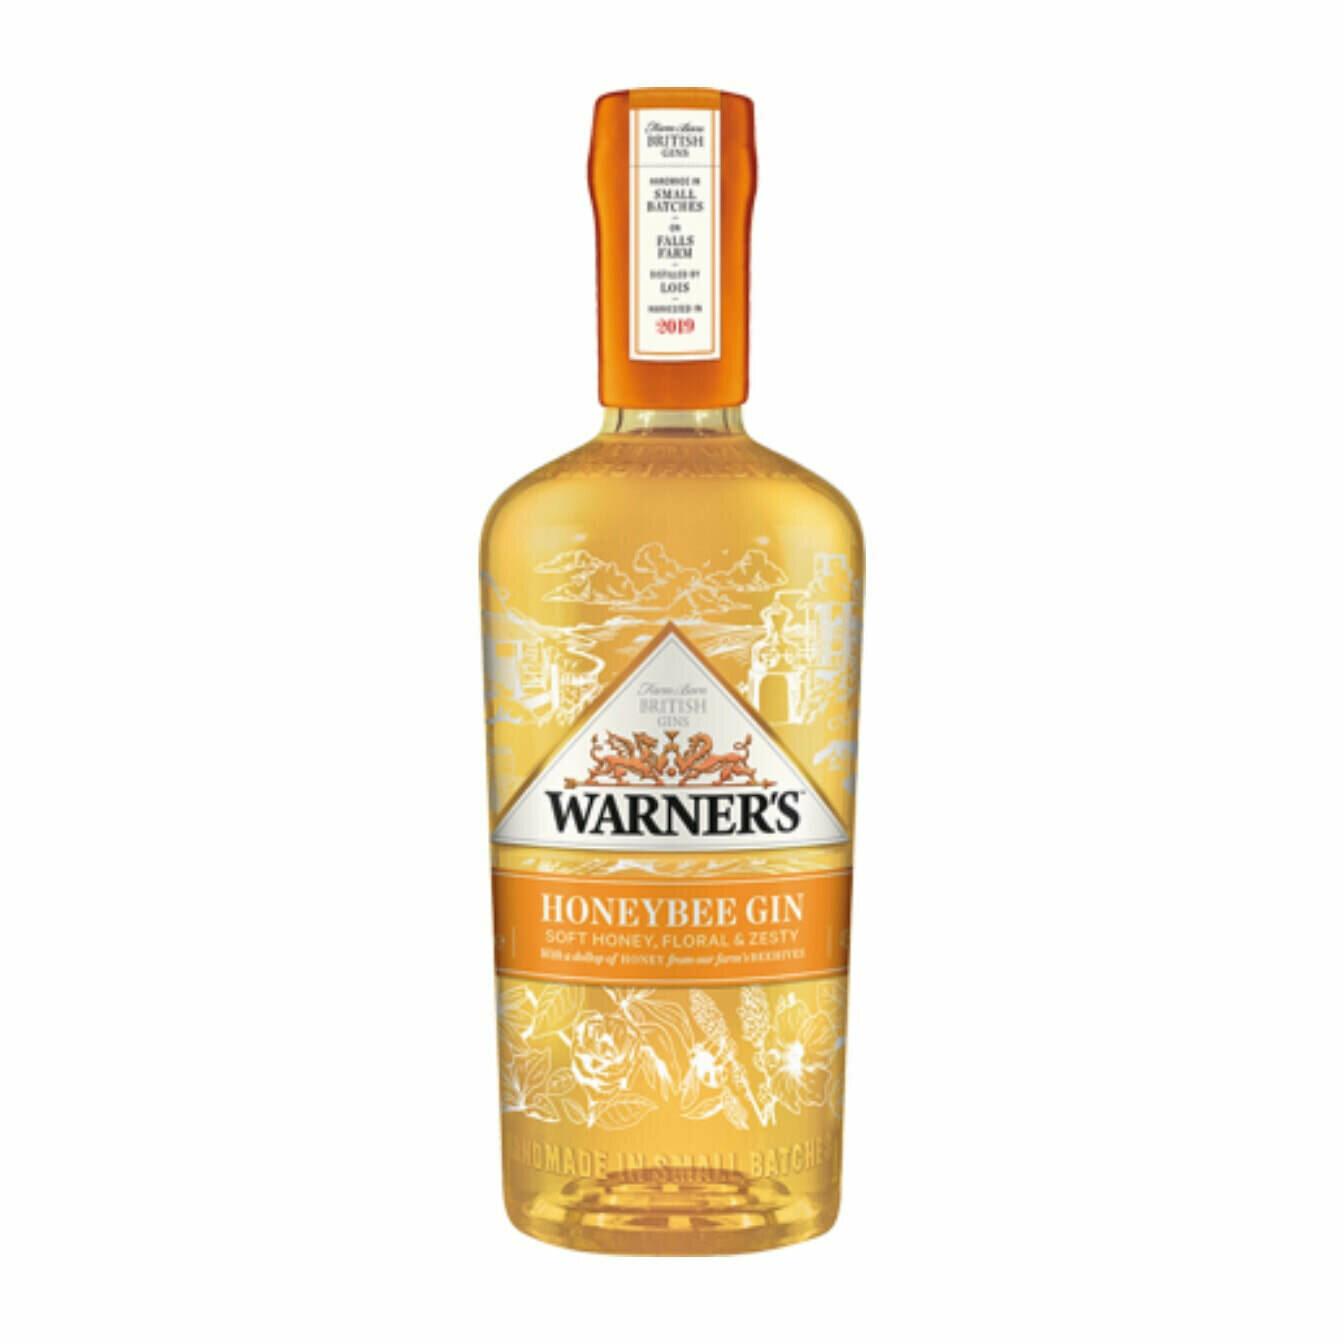 Warners Honeybee Gin